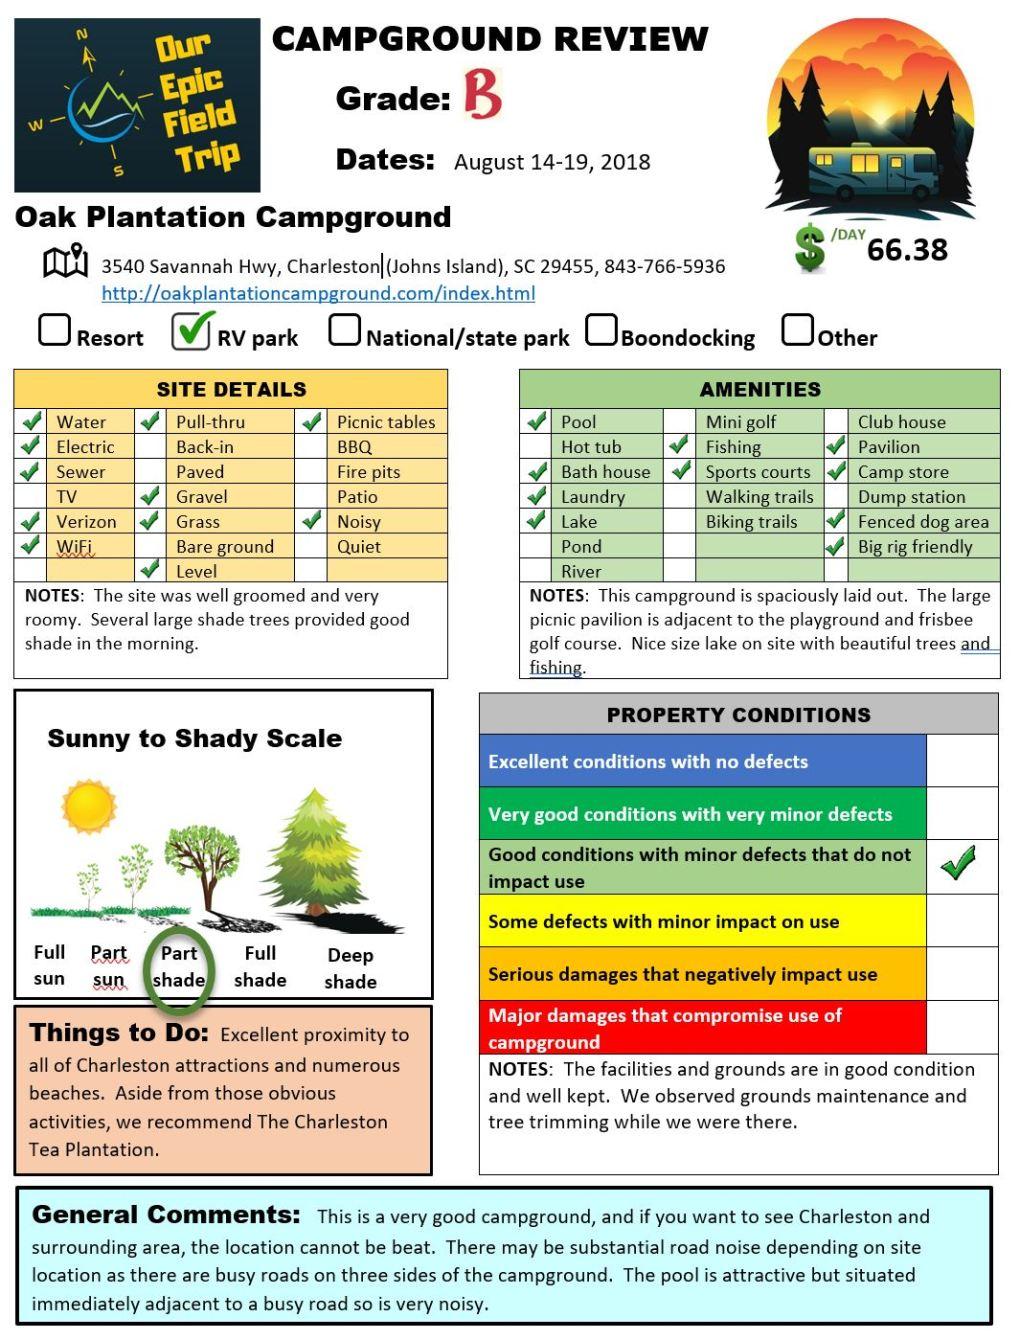 Campground Review - SC - Oak Plantation Campground-Charleston